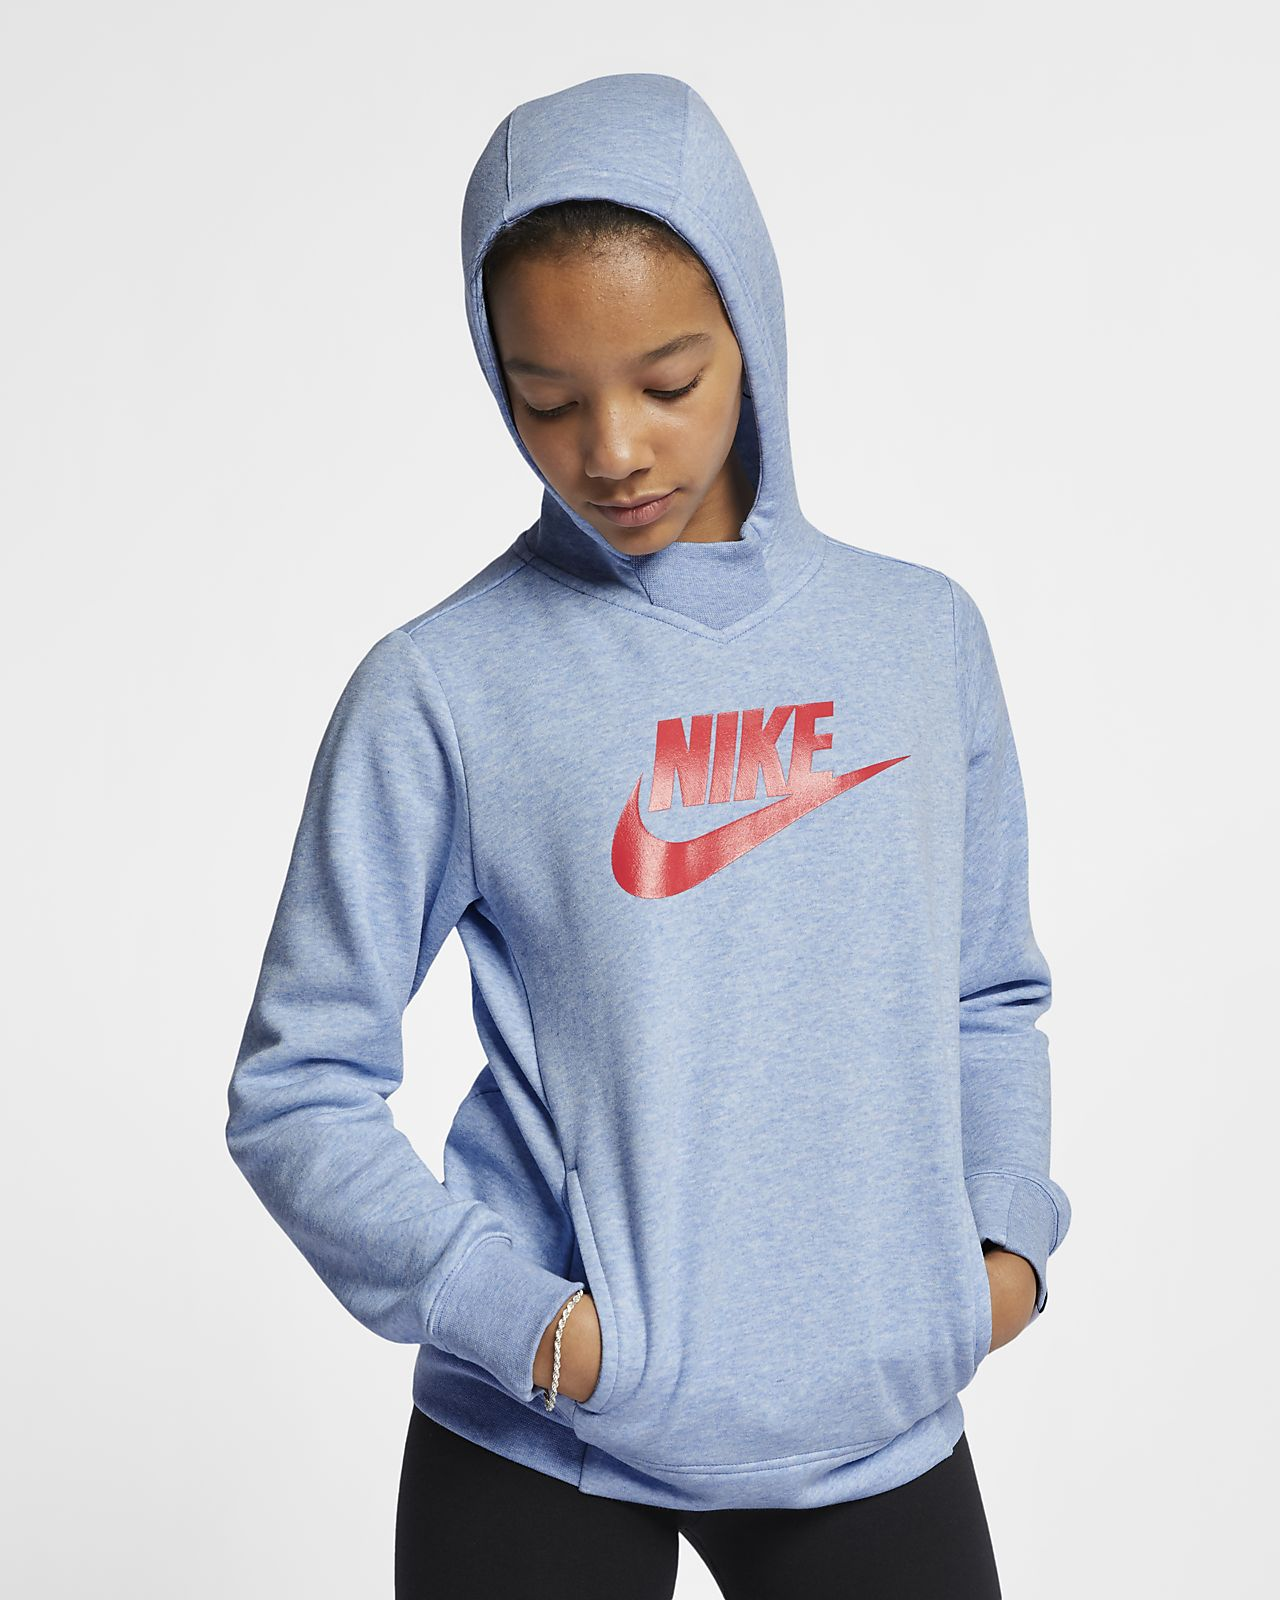 Sweat À Nike Capuche Motif Pour Âgée Plus Fille Sportswear qaqRpxwTr